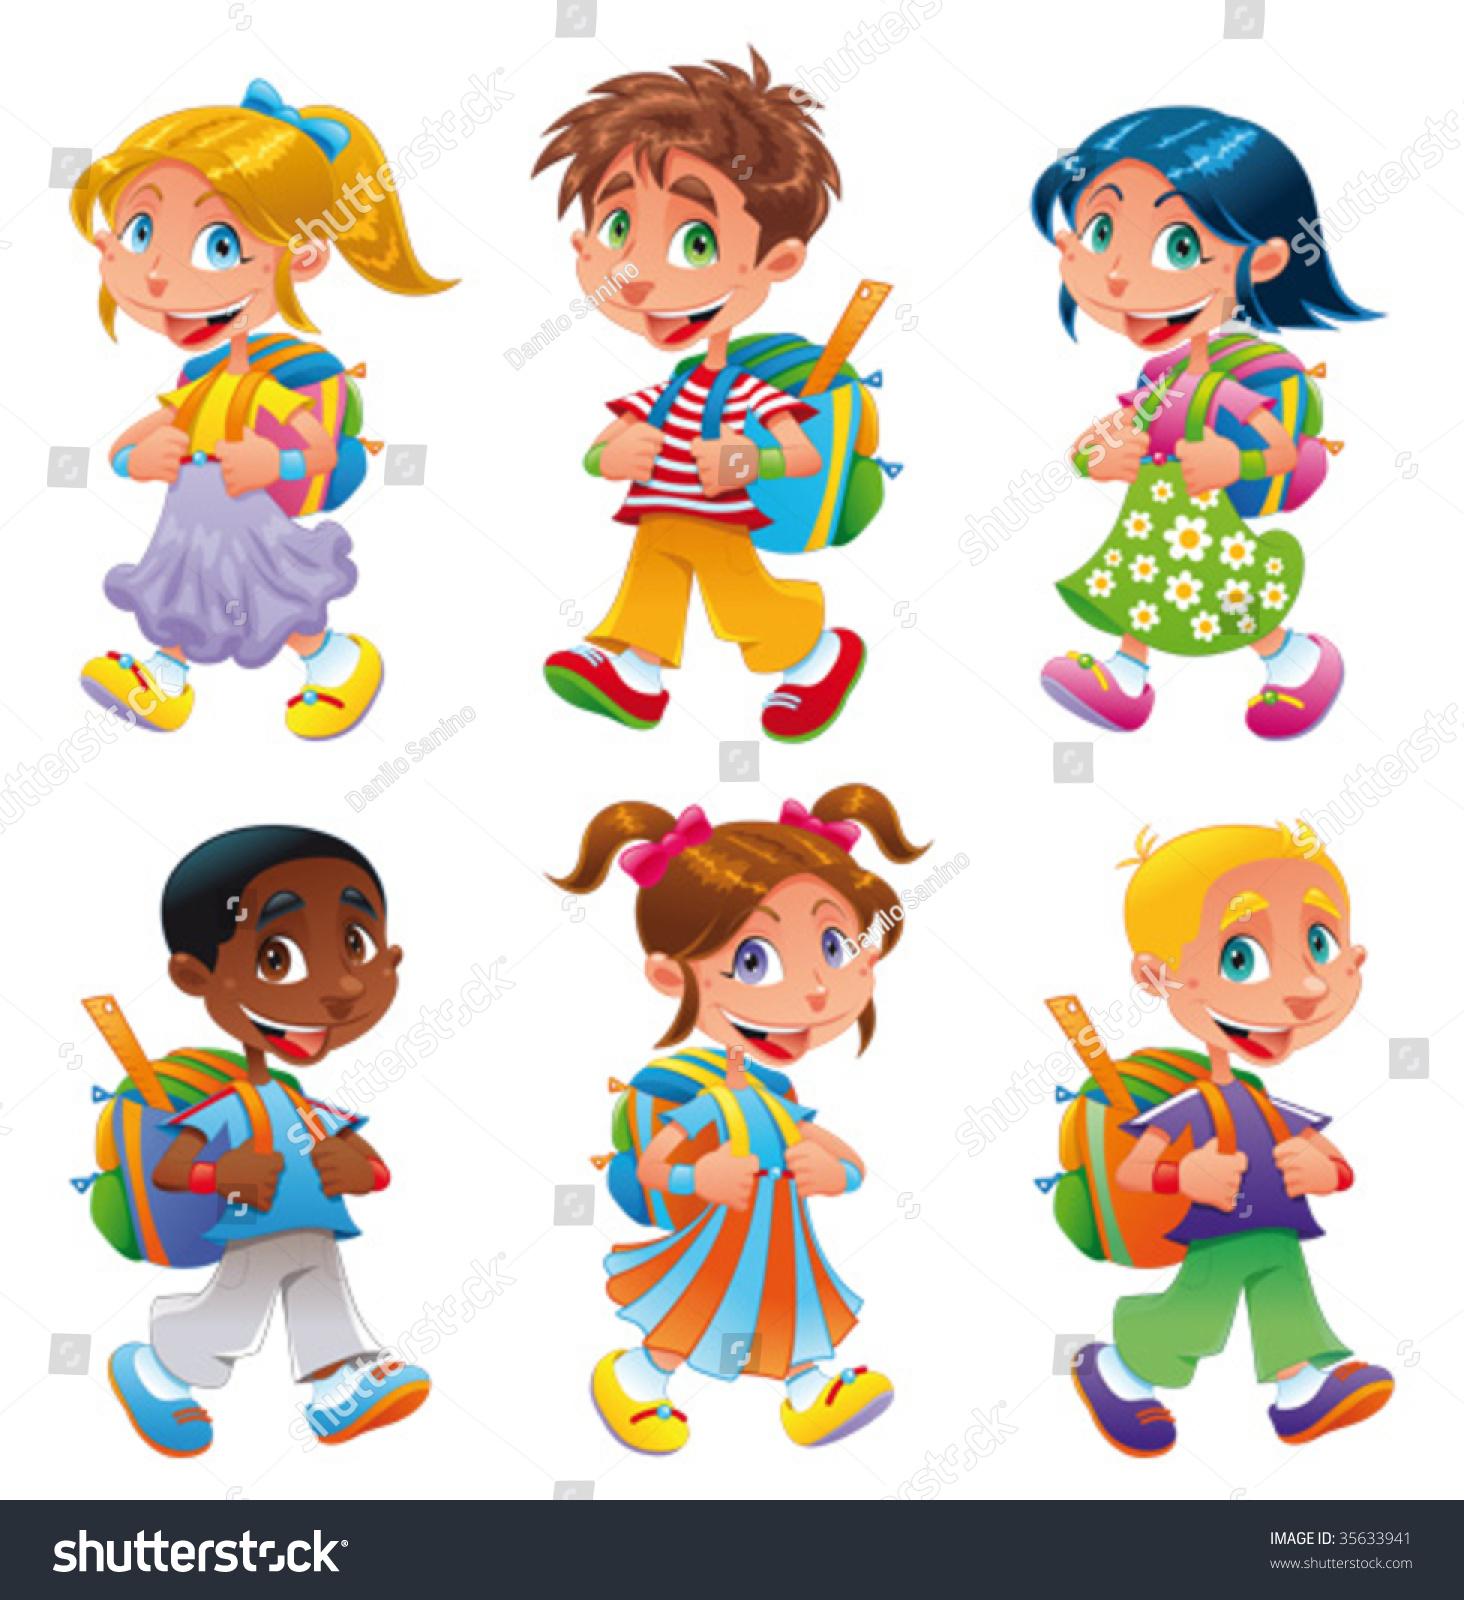 Funny Cartoon Images Of Boys boys girls go school funny cartoon stock vector (royalty